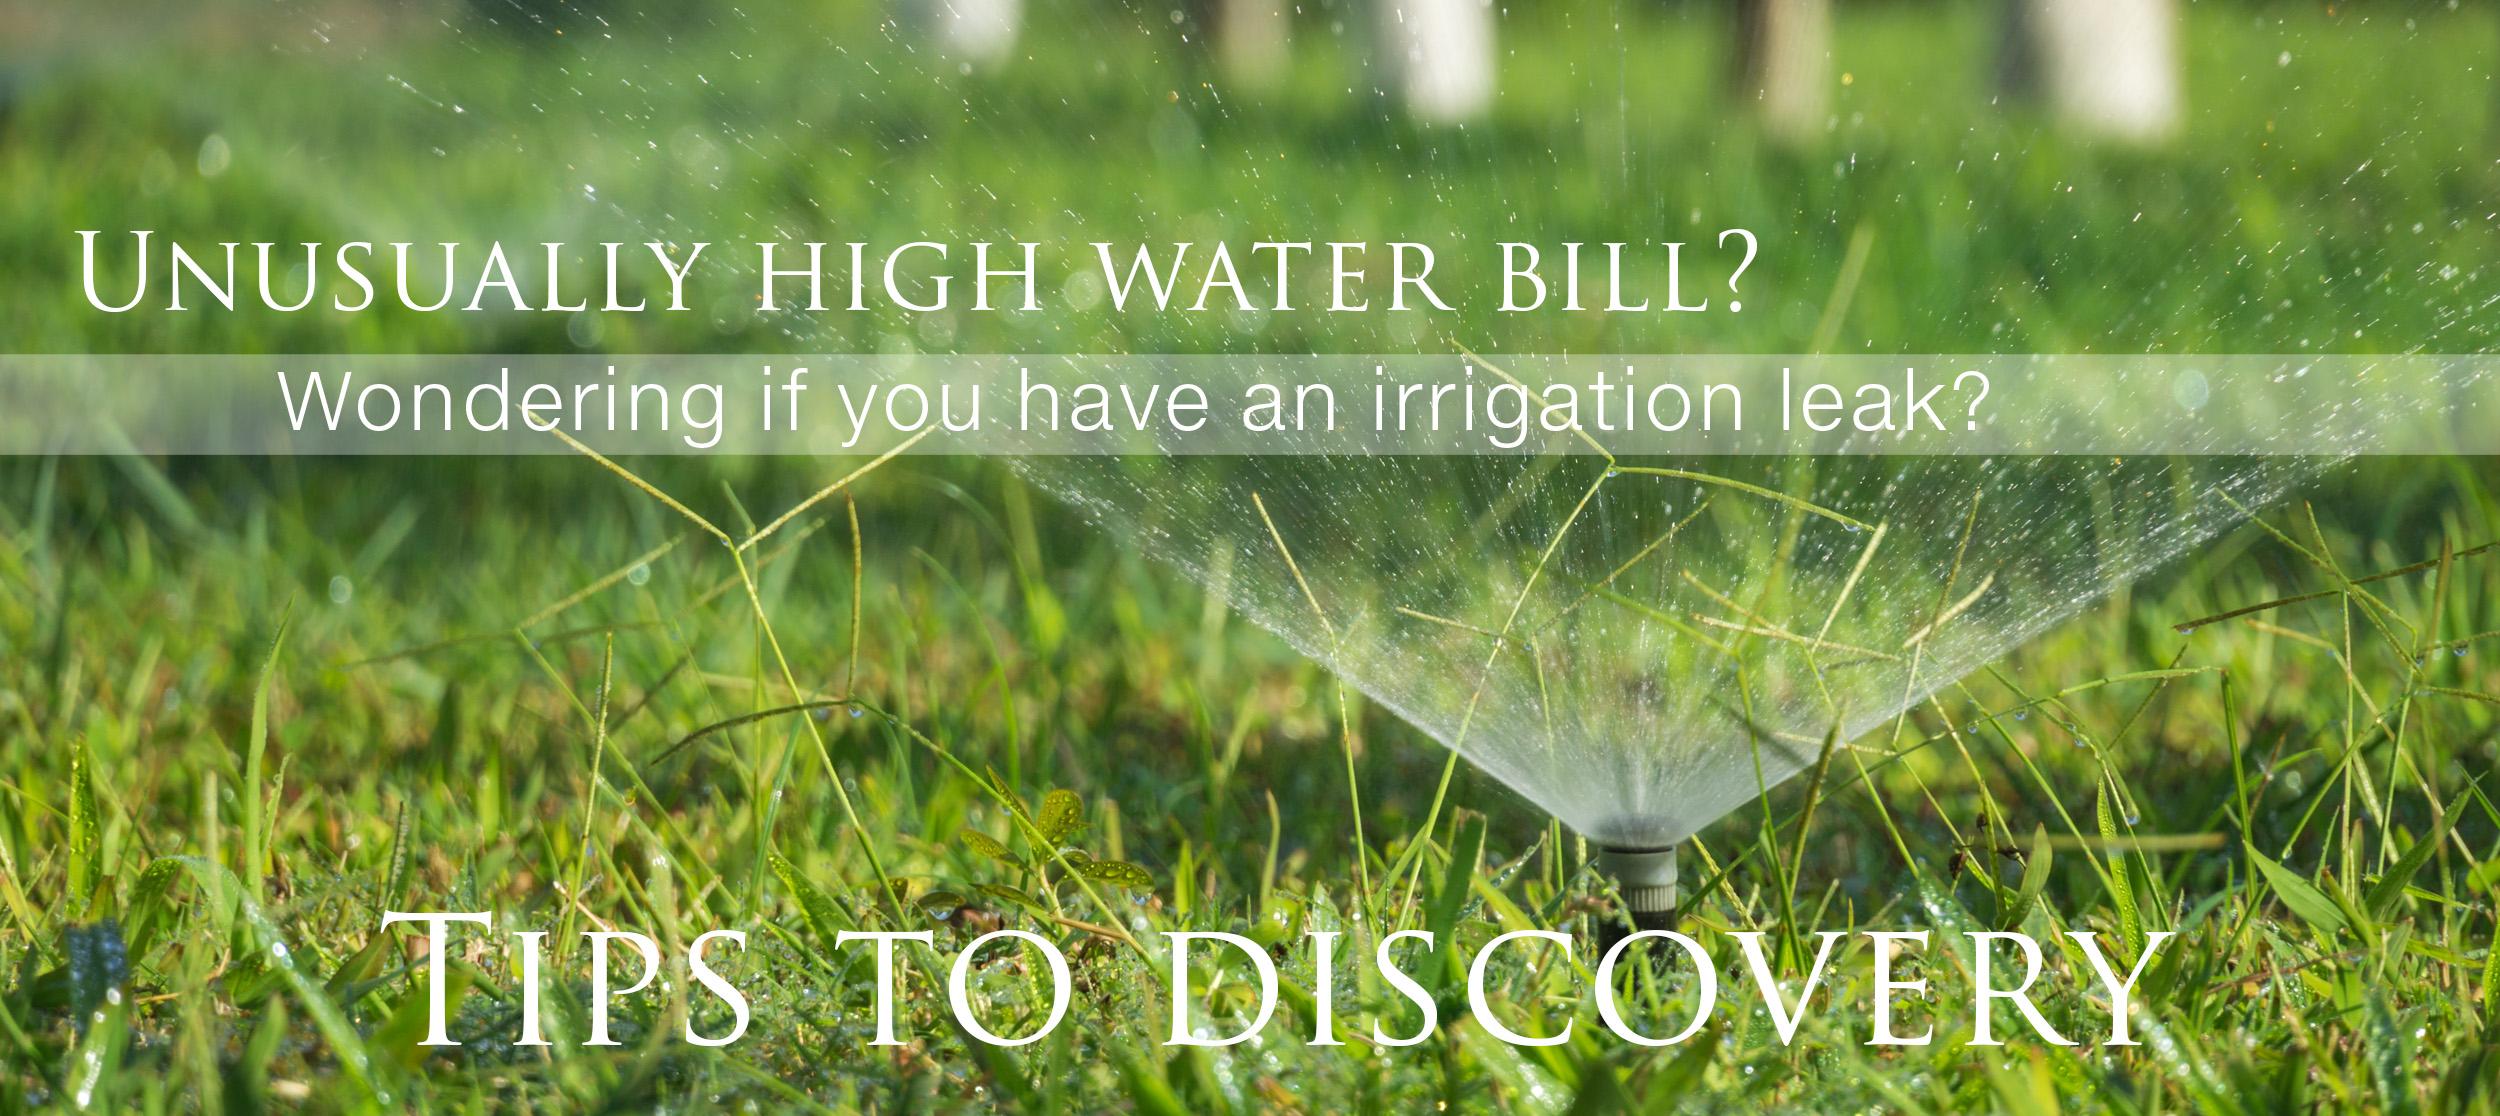 Irrigation Leak High Water Bill